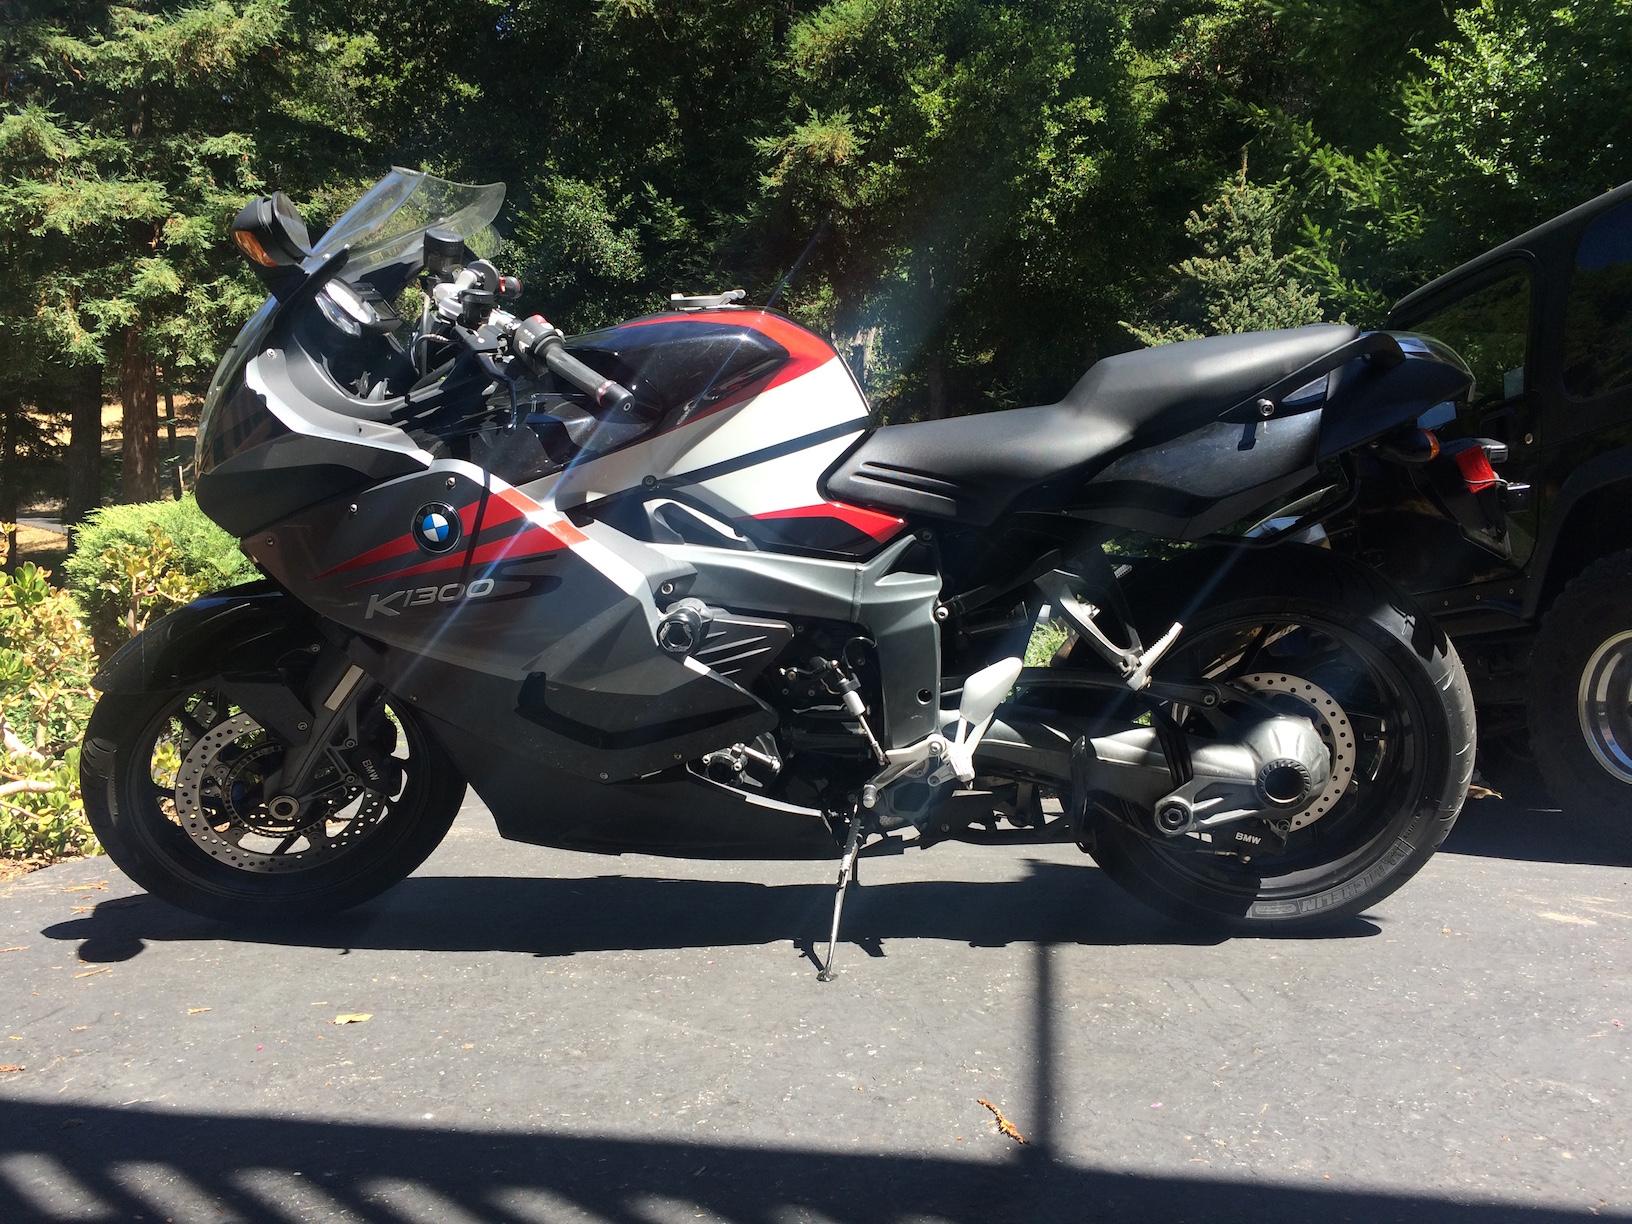 Motorcycle Black Box Installed On Bmw K1300s Motorcycle Camera